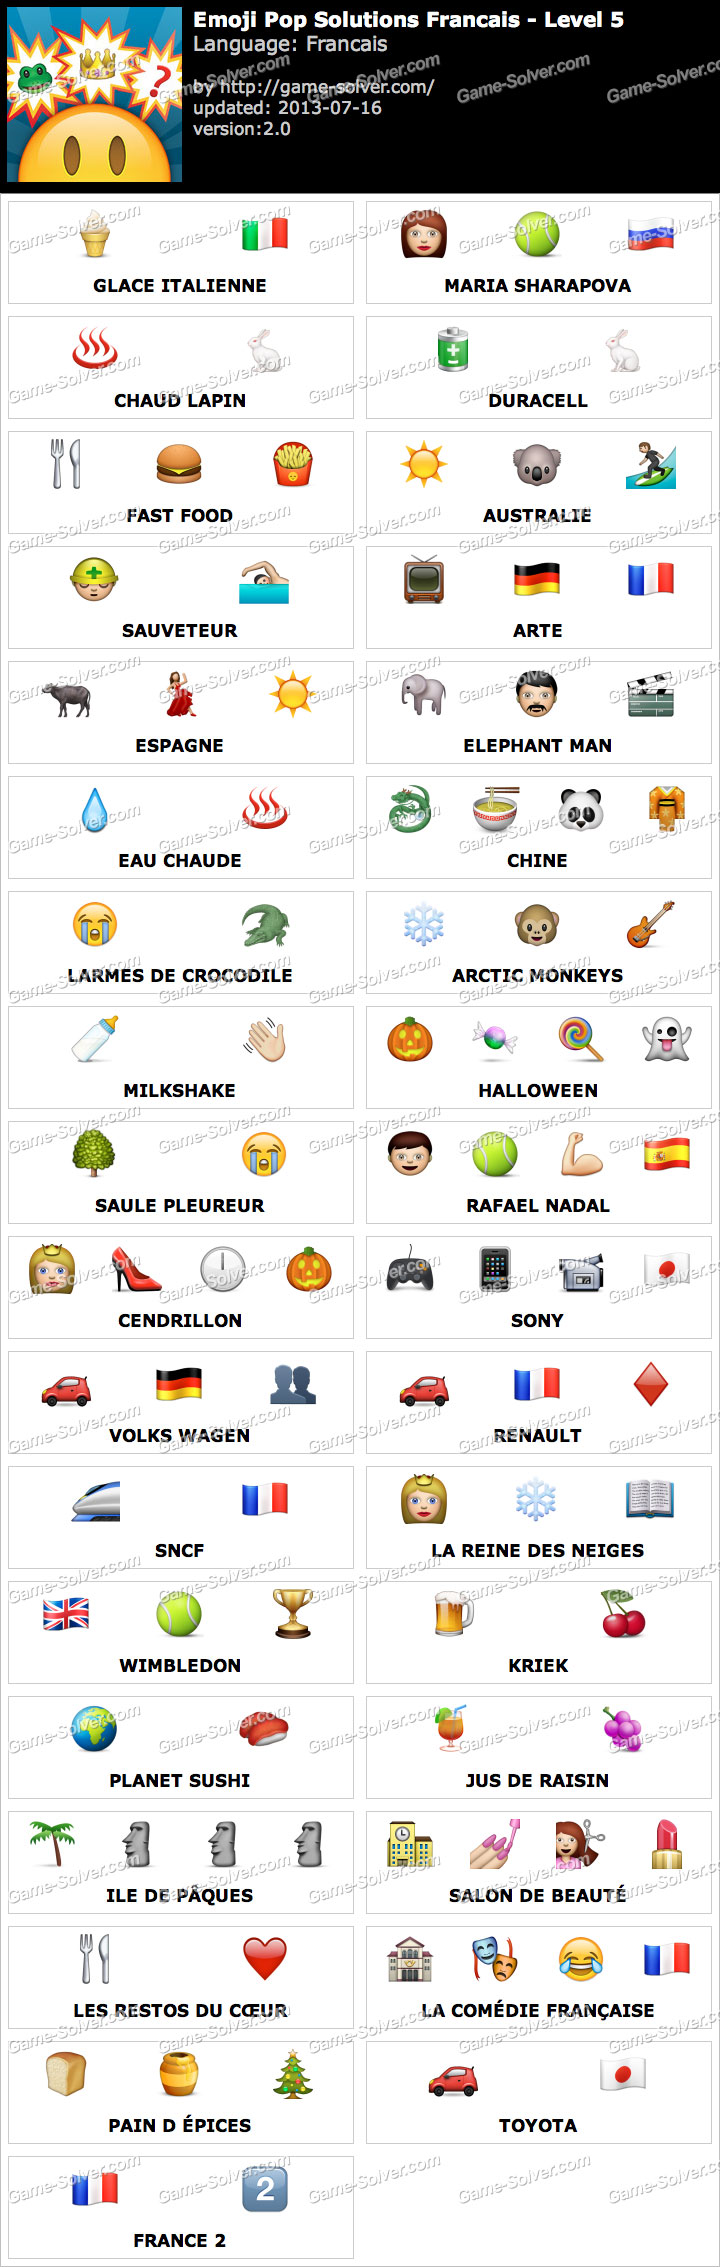 Fabuleux Emoji Pop Niveau 5 - Game Solver JB24